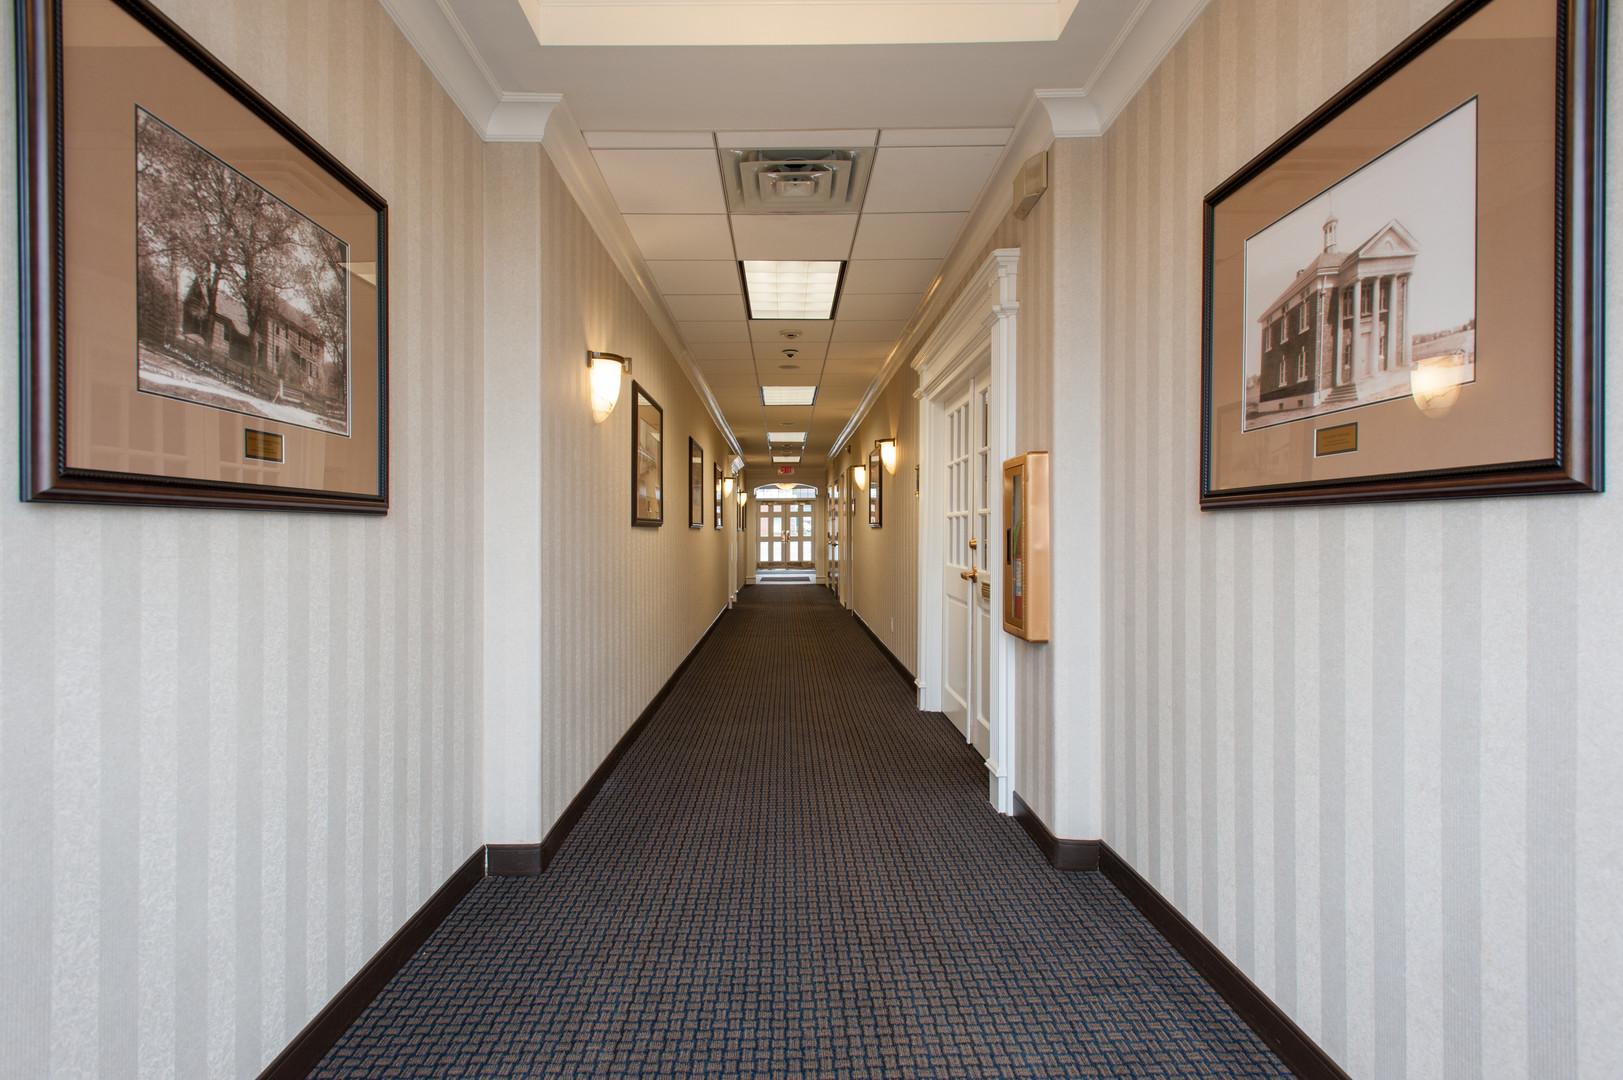 180_-_Hallway1 (1).jpg